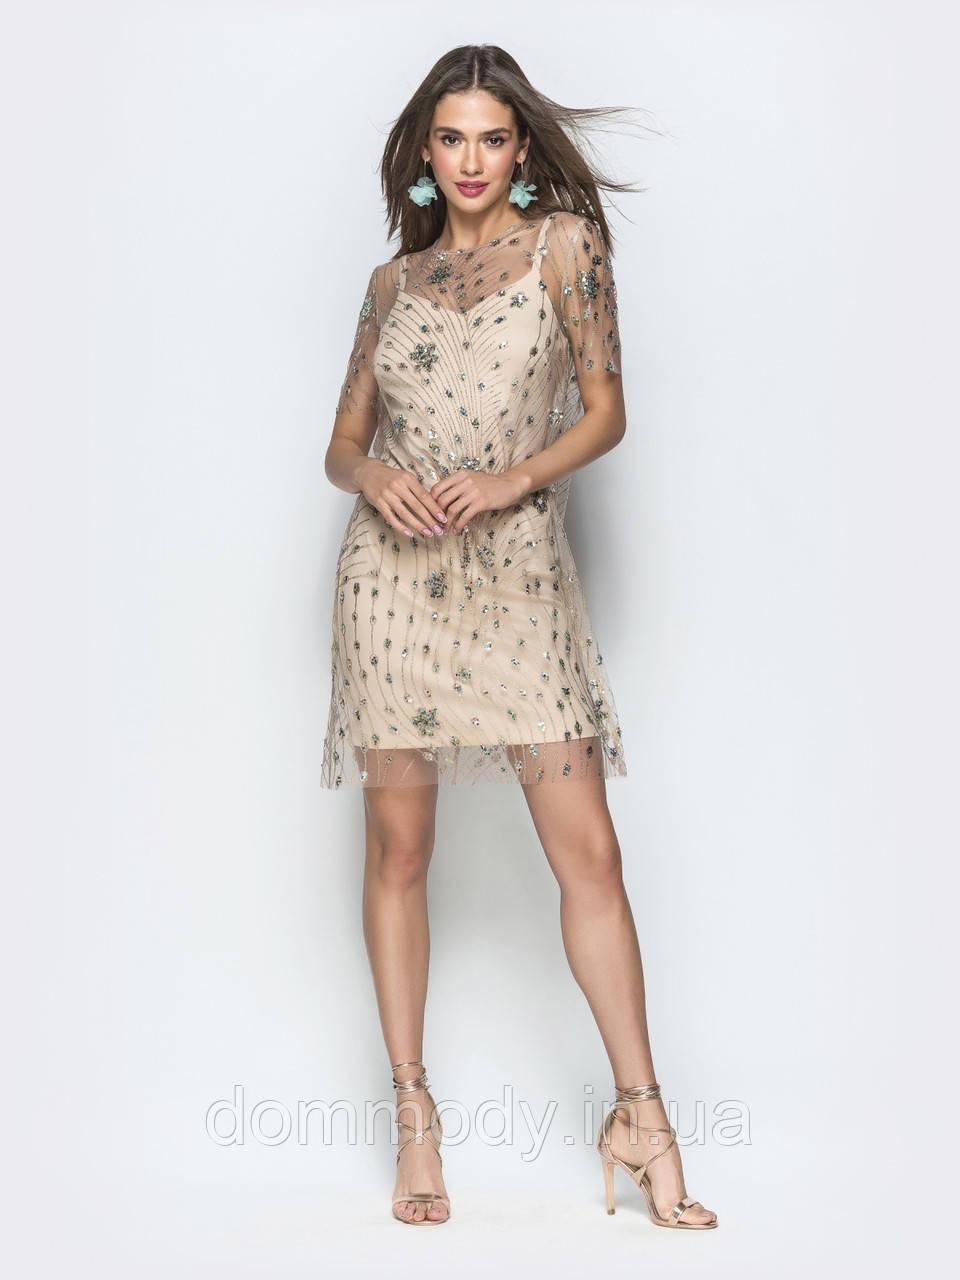 Платье женское Hot tango  beige